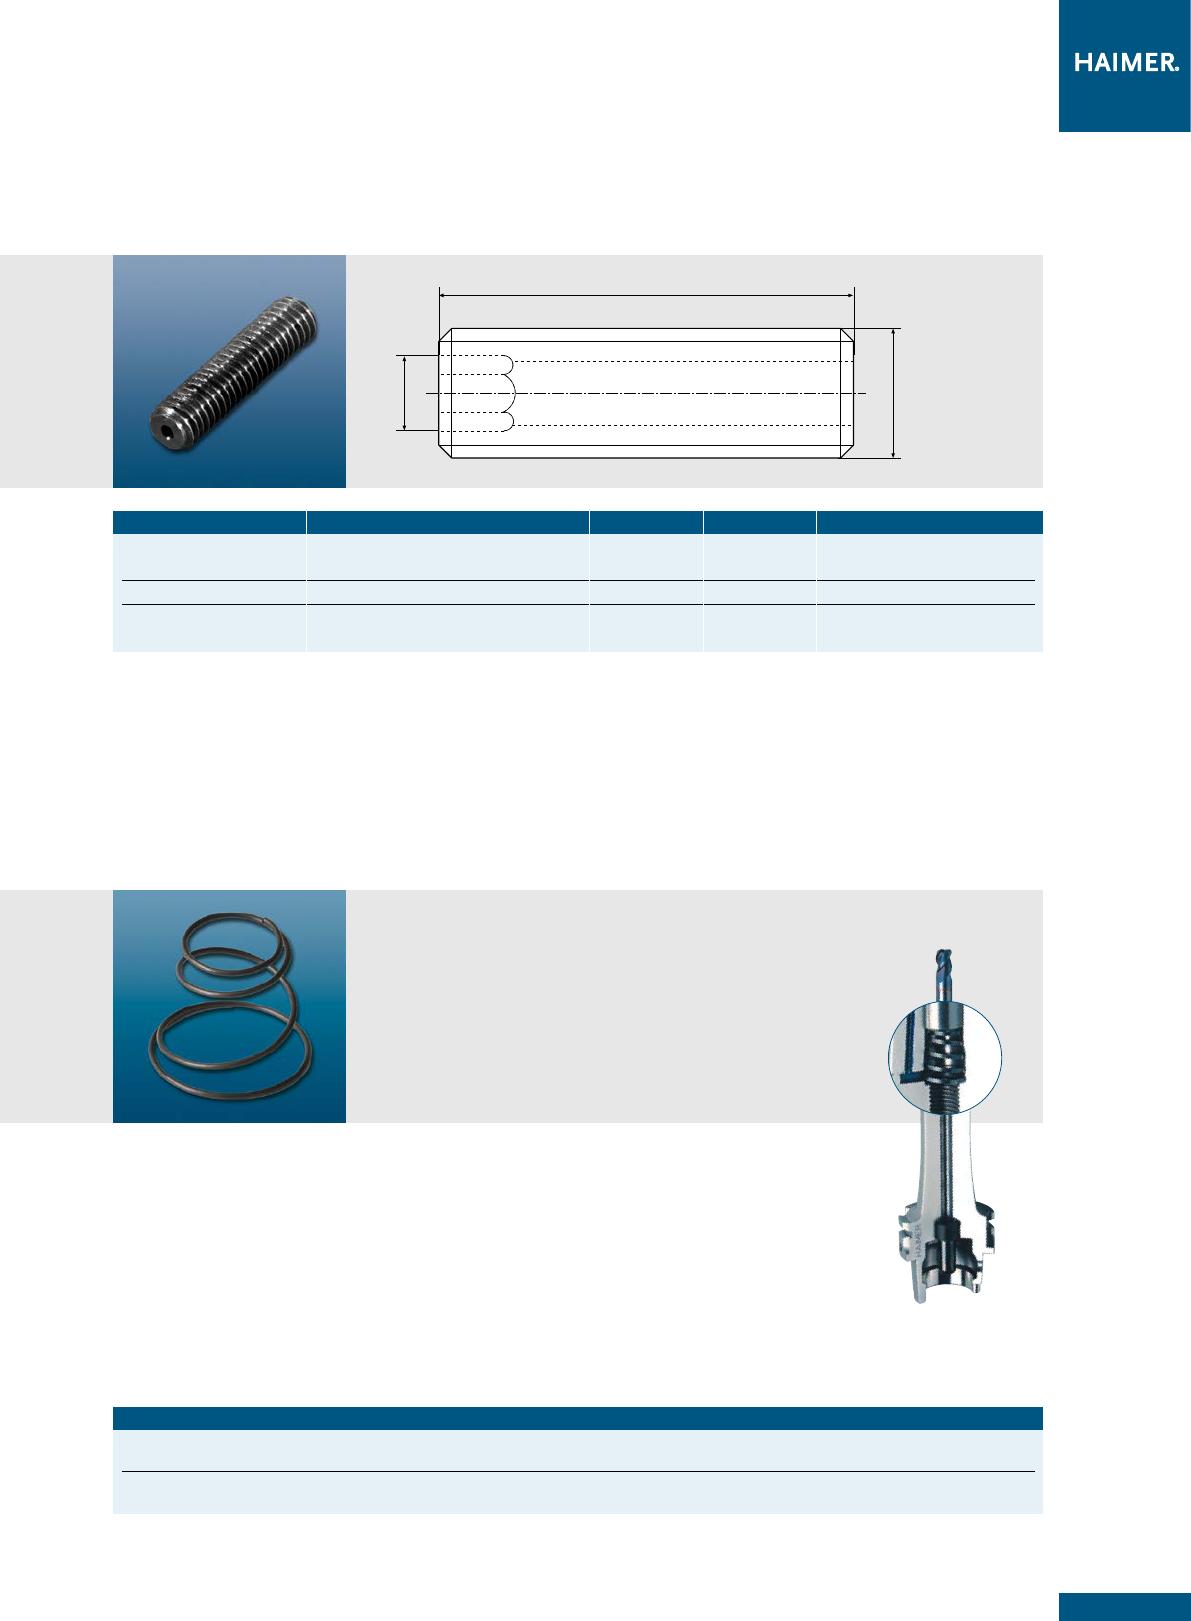 Haimer 79.200.20 Sawblade Adapter for Sawblade with 20 mm Diameter